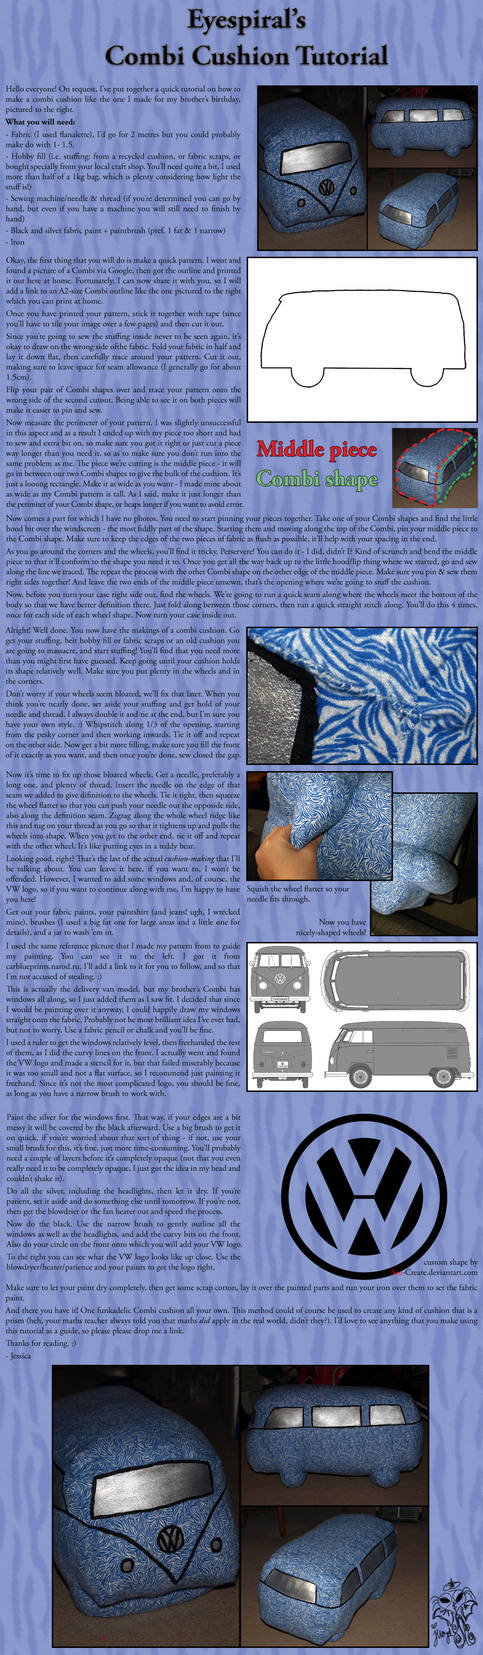 Combi Cushion Tutorial